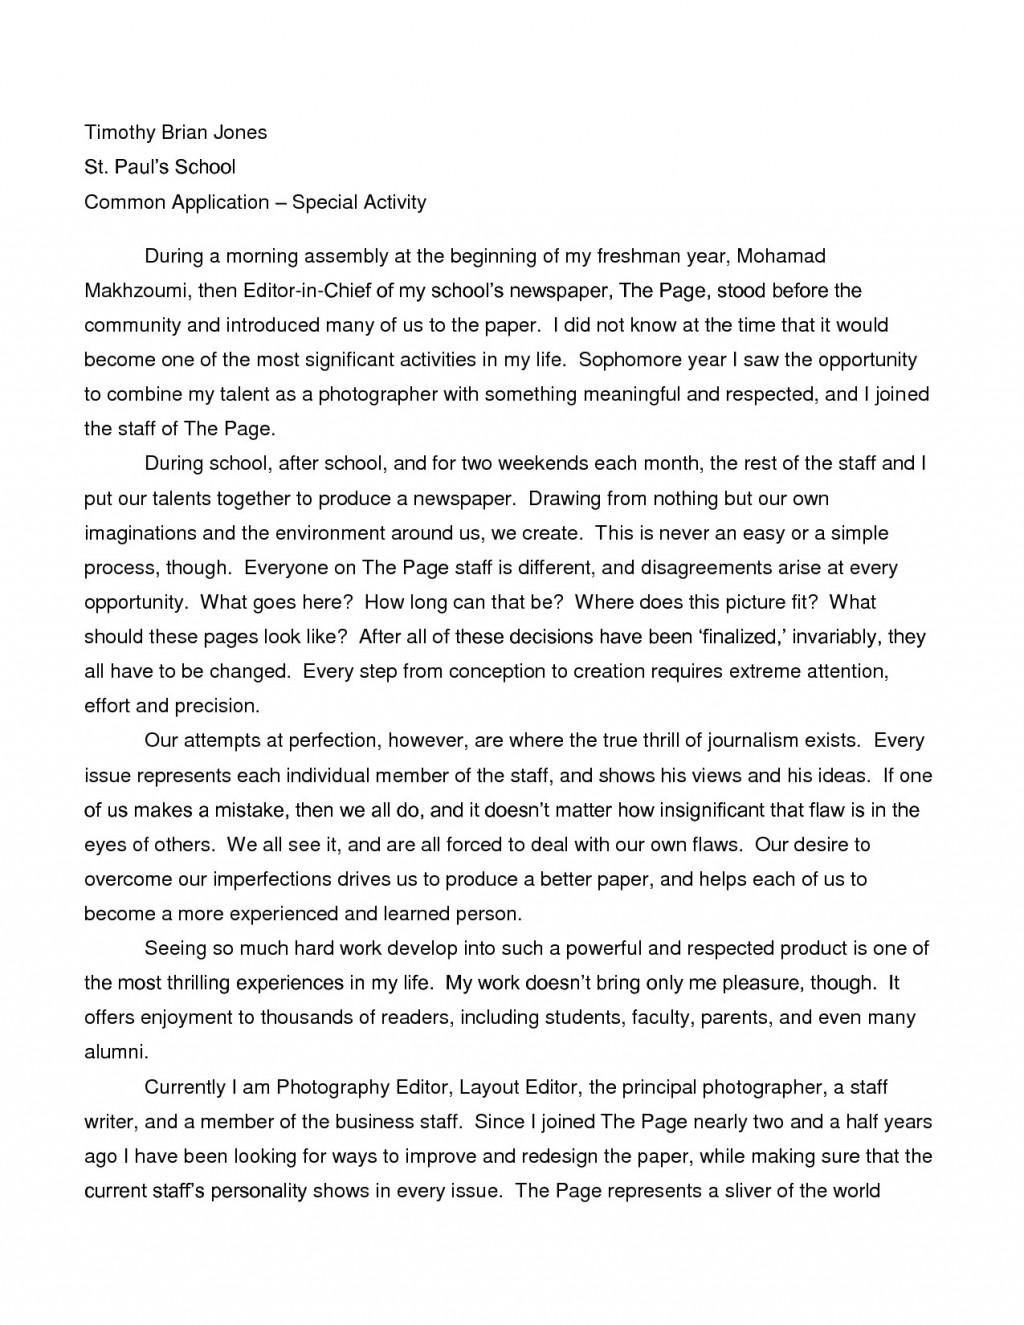 025 Paragraph Essay Example High School Free Samples Graduate Essays Of Persuasive L Sensational 5 Pdf Template For Large